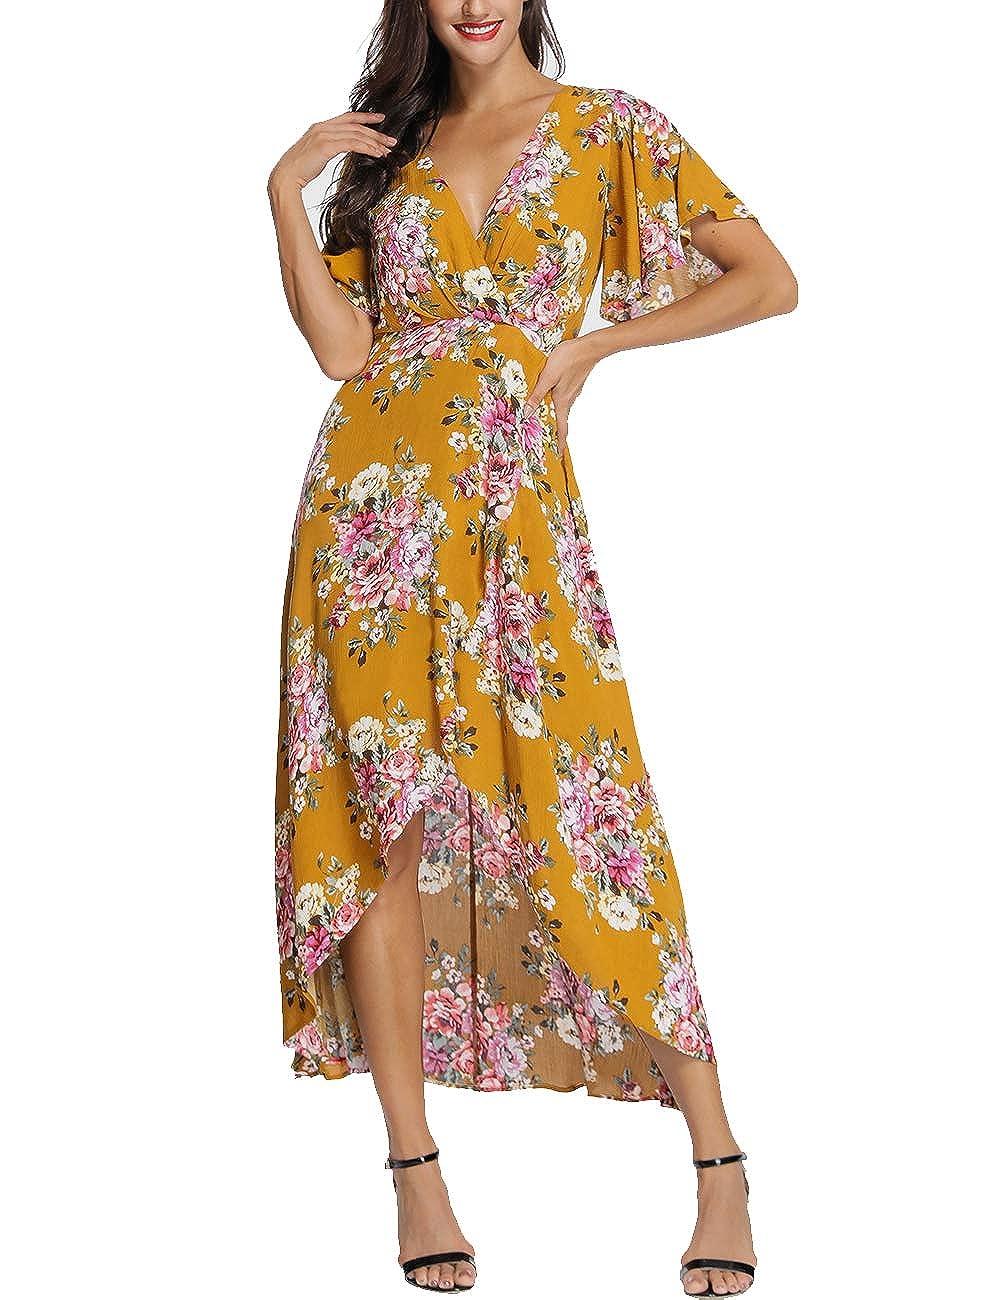 3dcbd8012ac Azalosie Wrap Maxi Dress Short Sleeve V Neck Floral Flowy Front Slit High  Low Women Summer Beach Party Wedding Dress at Amazon Women s Clothing store